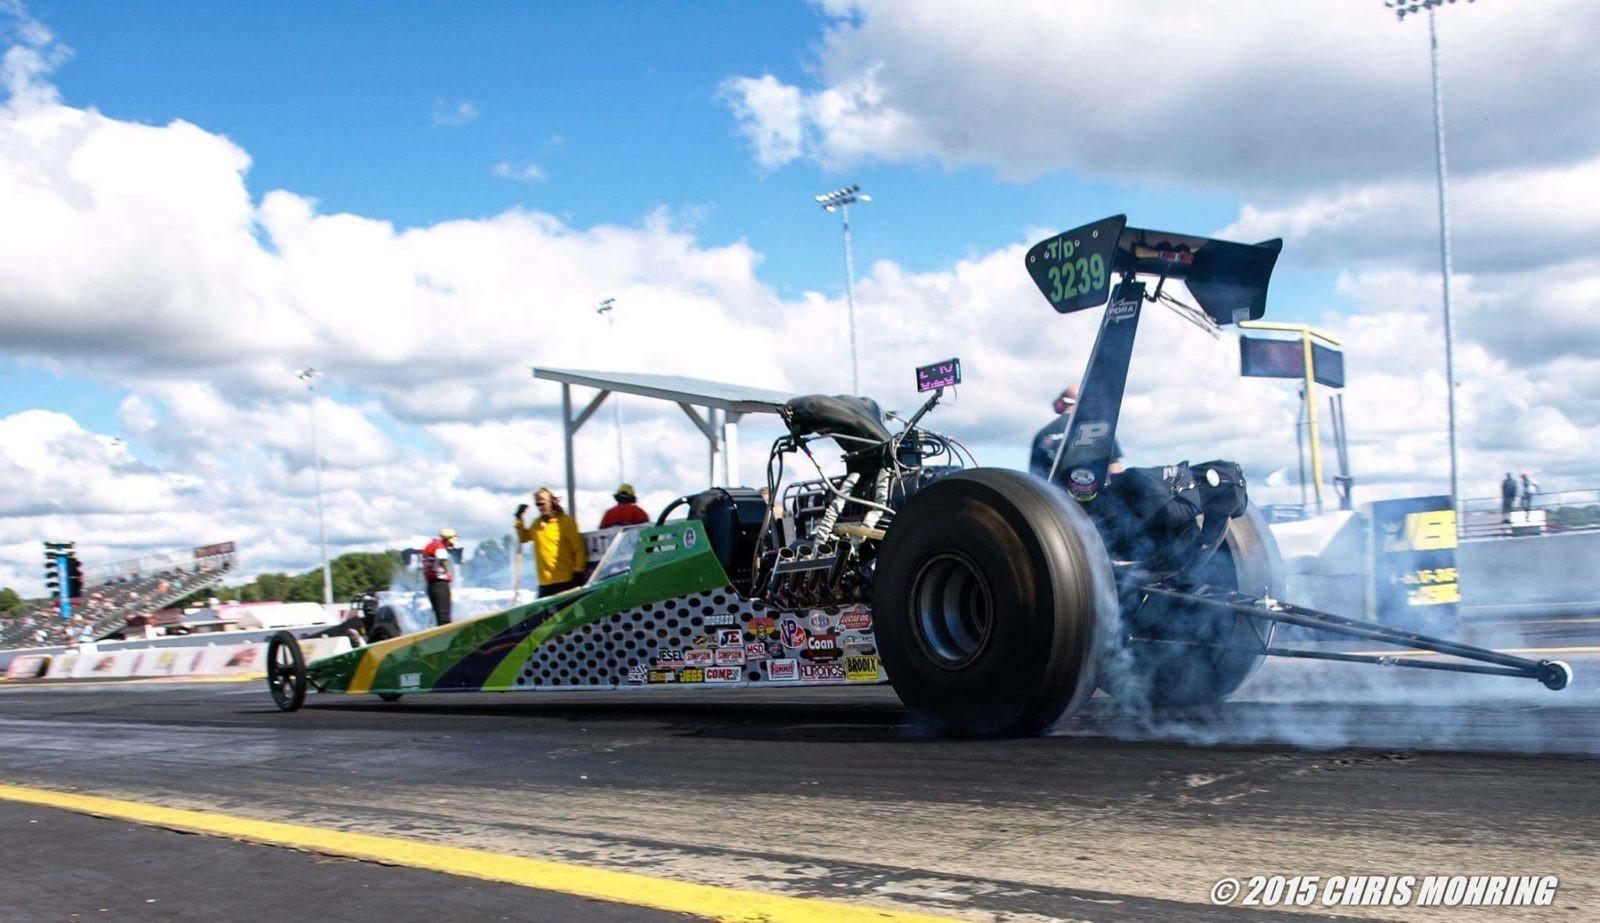 ashley-tidrick-racing-comsync-efi1-1600x